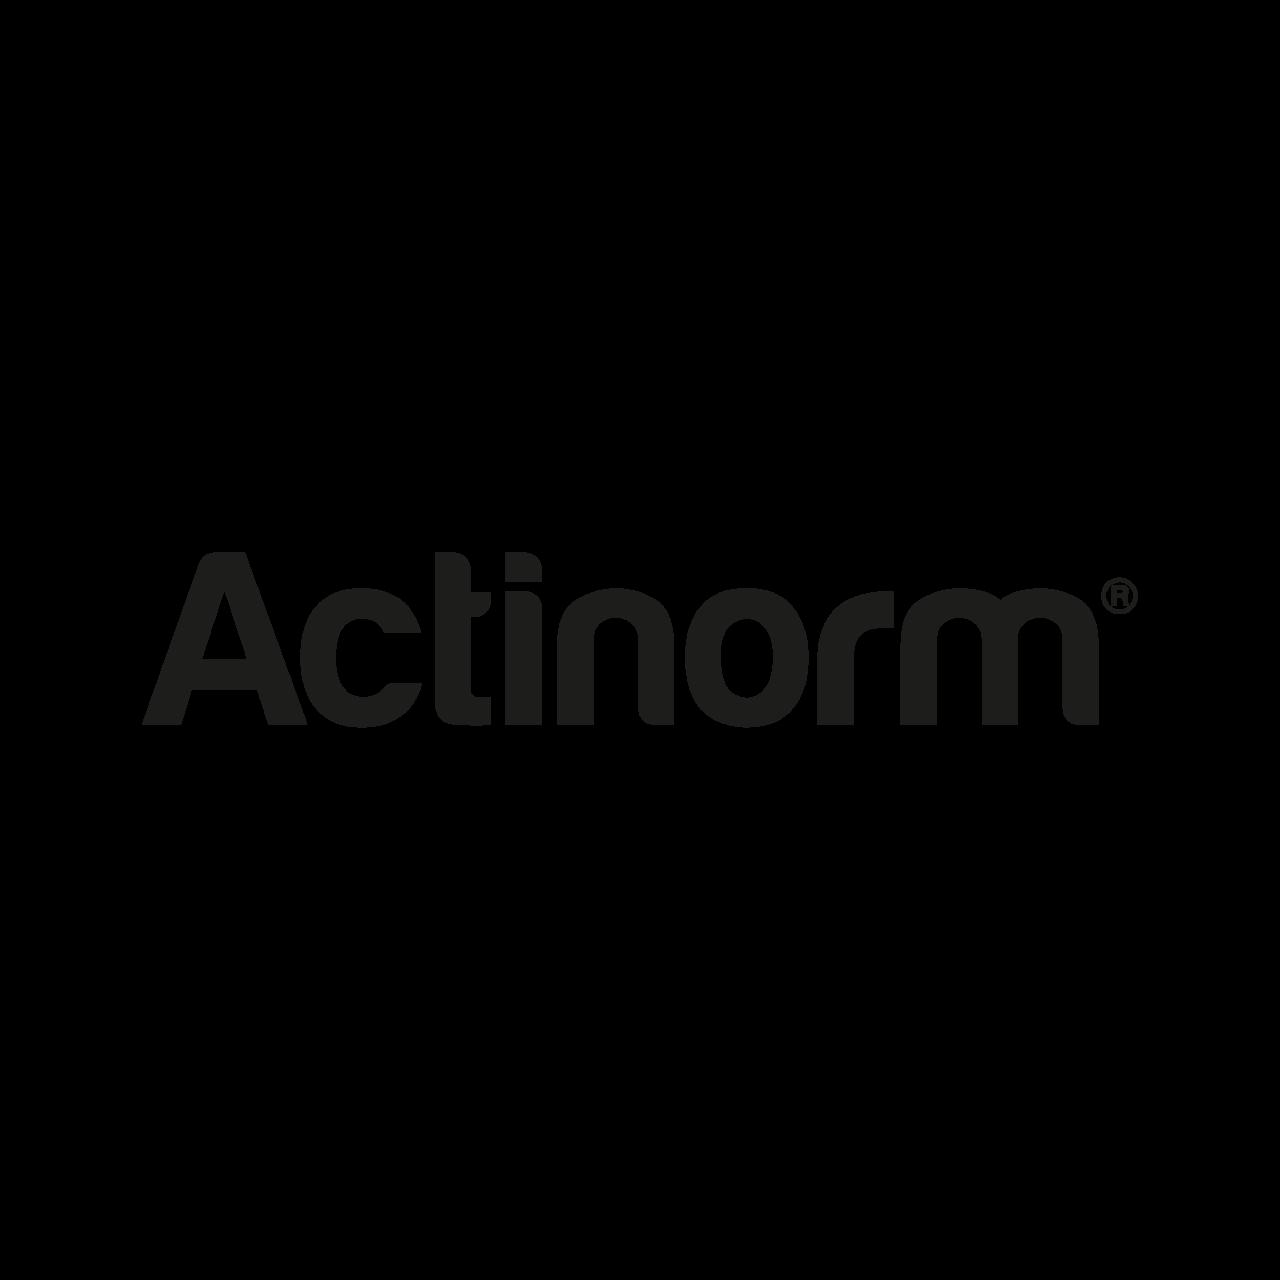 Actinorm® logo